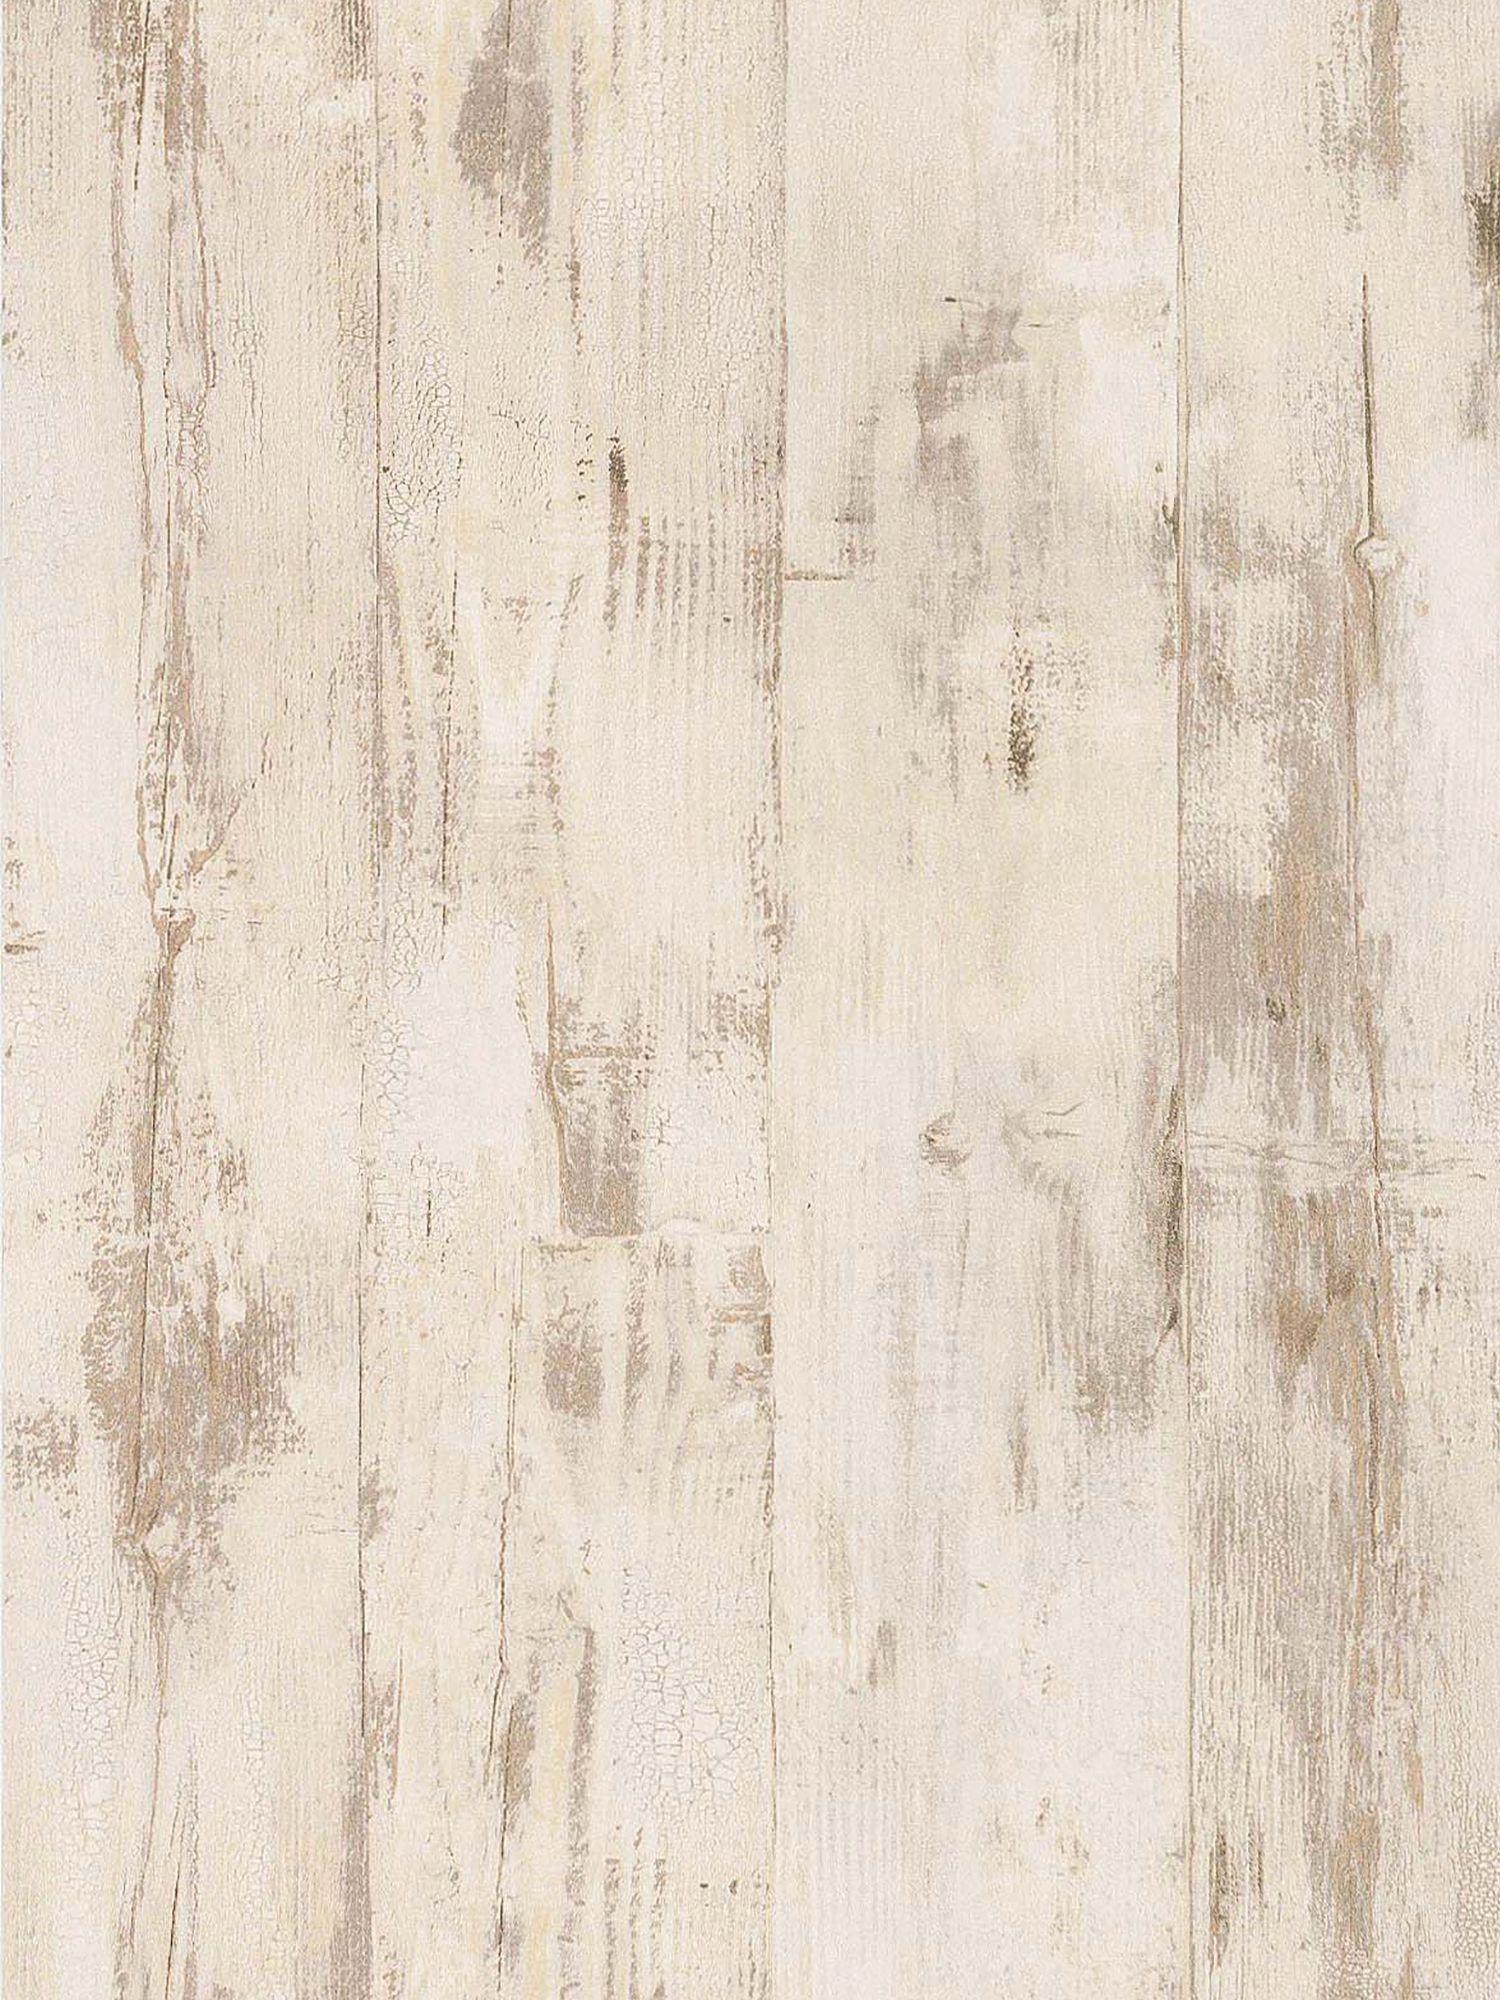 Galerie Galerie Rustic Wood Wallpaper, 51144707